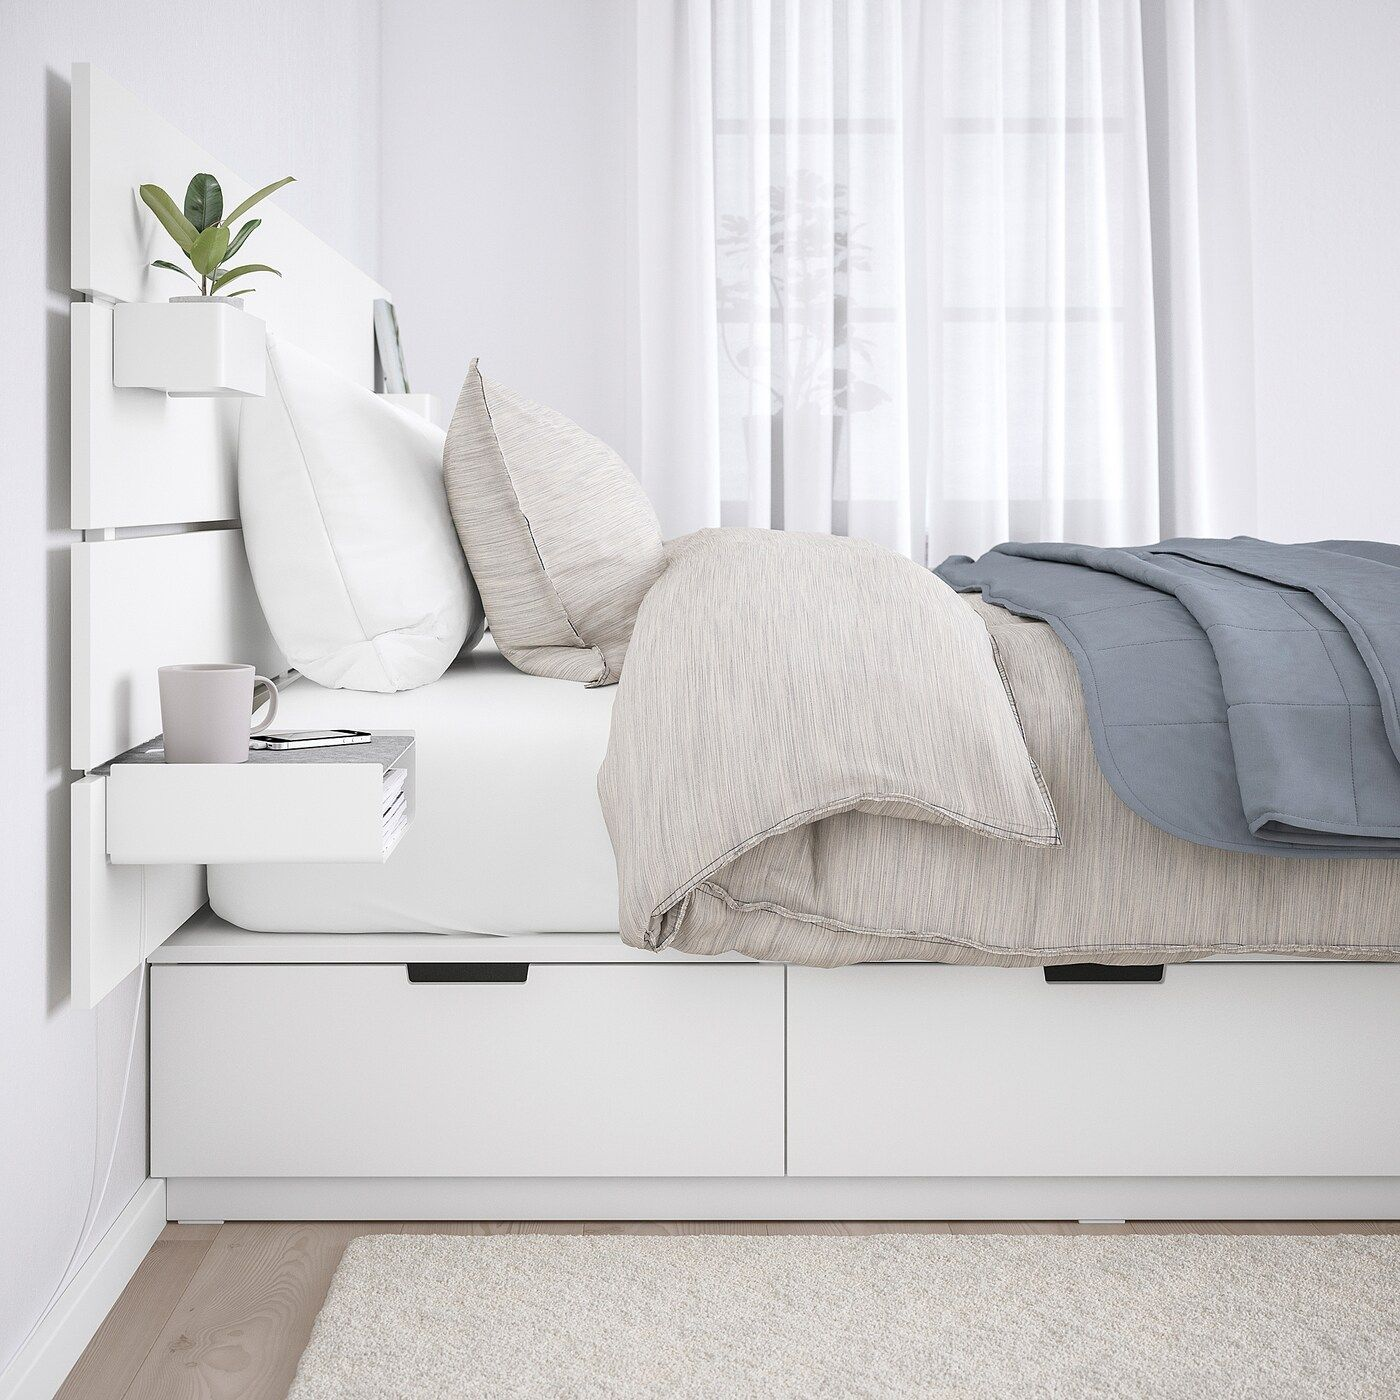 NORDLI Bed with headboard and storage – white – IKEA